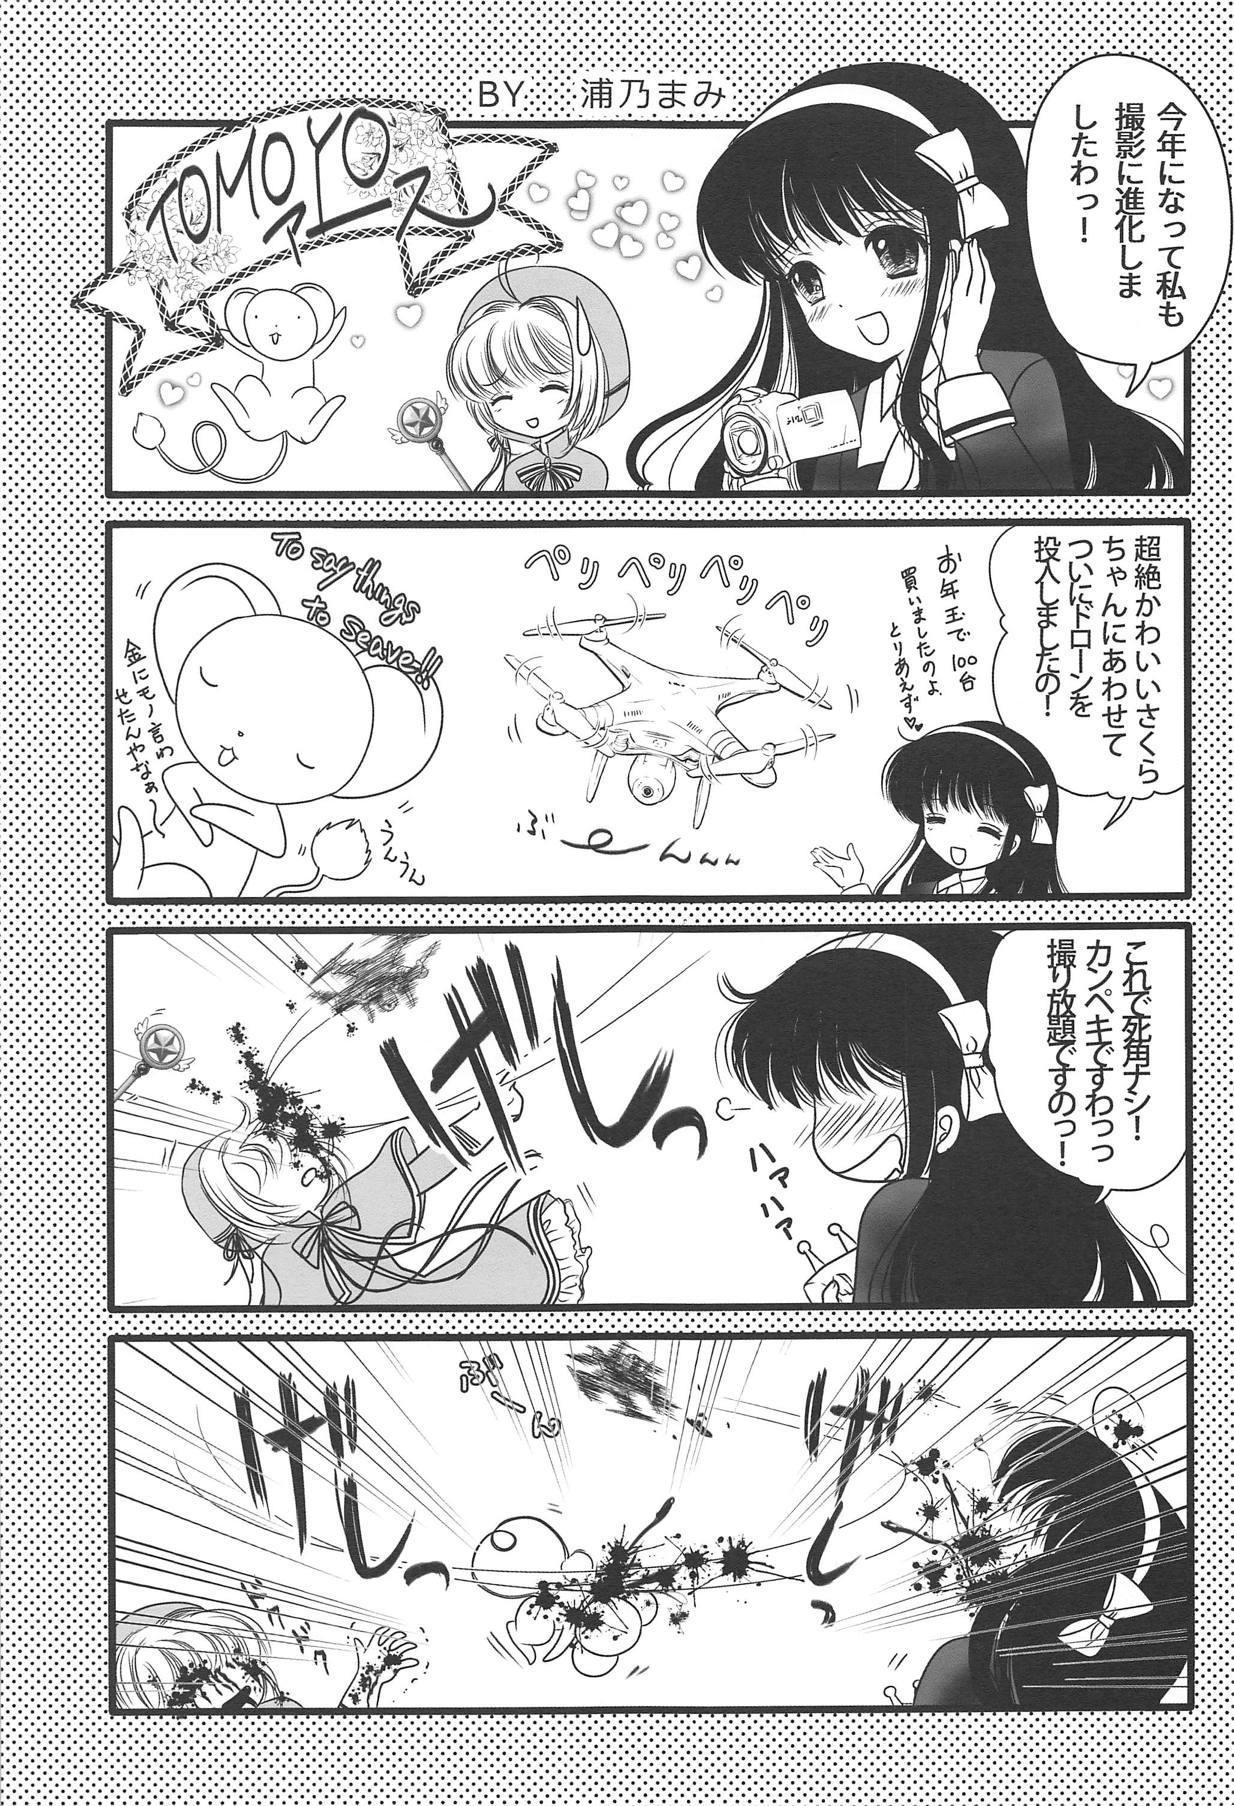 (C95) [TRAP (Urano Mami)] SAO ~sokoni anatato omoideto~ ETERNAL (Sword Art Online) 25